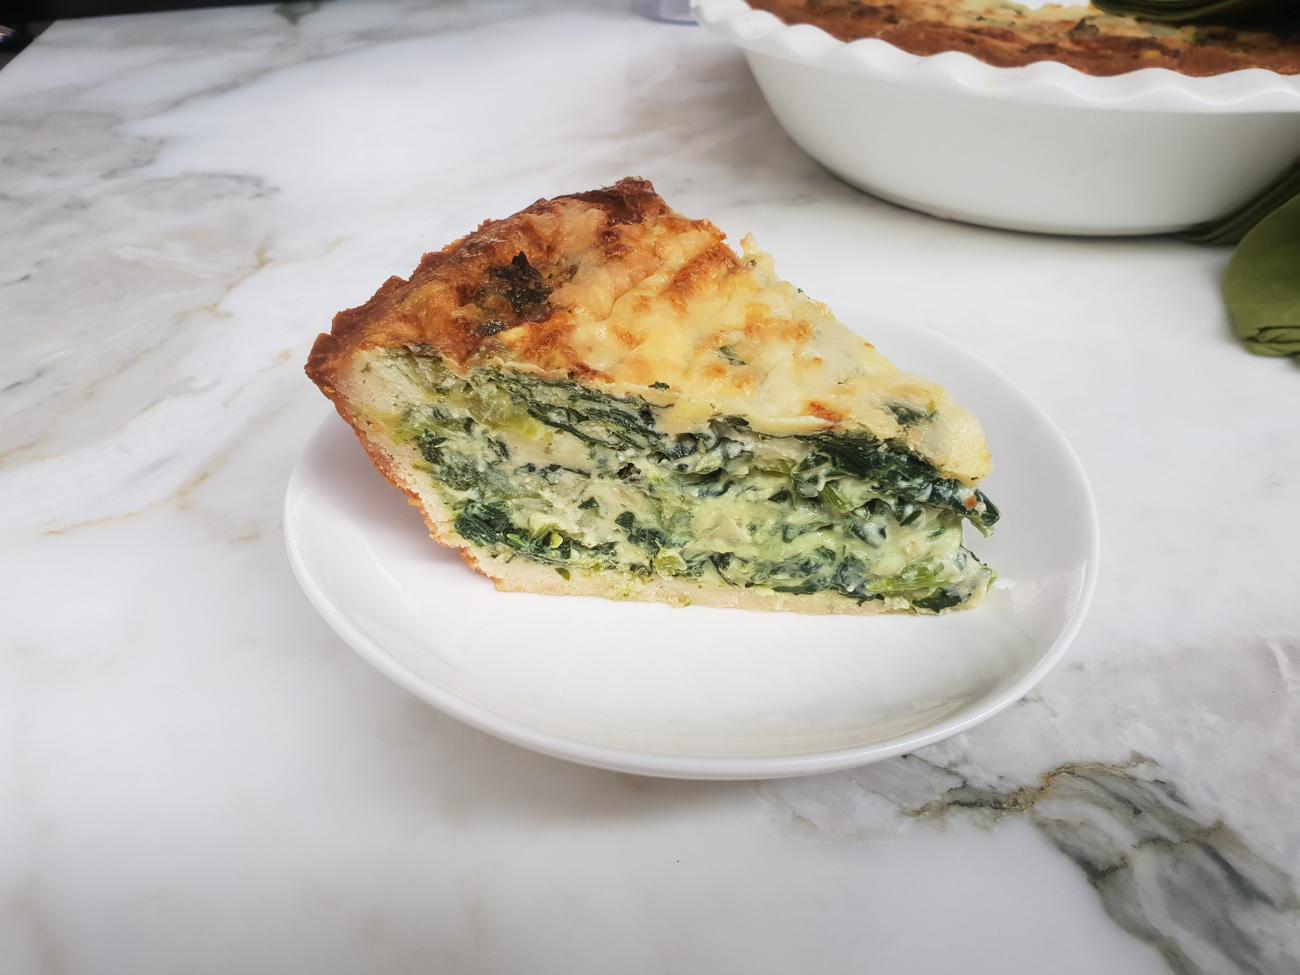 Crustless Spinach and Ricotta Quiche